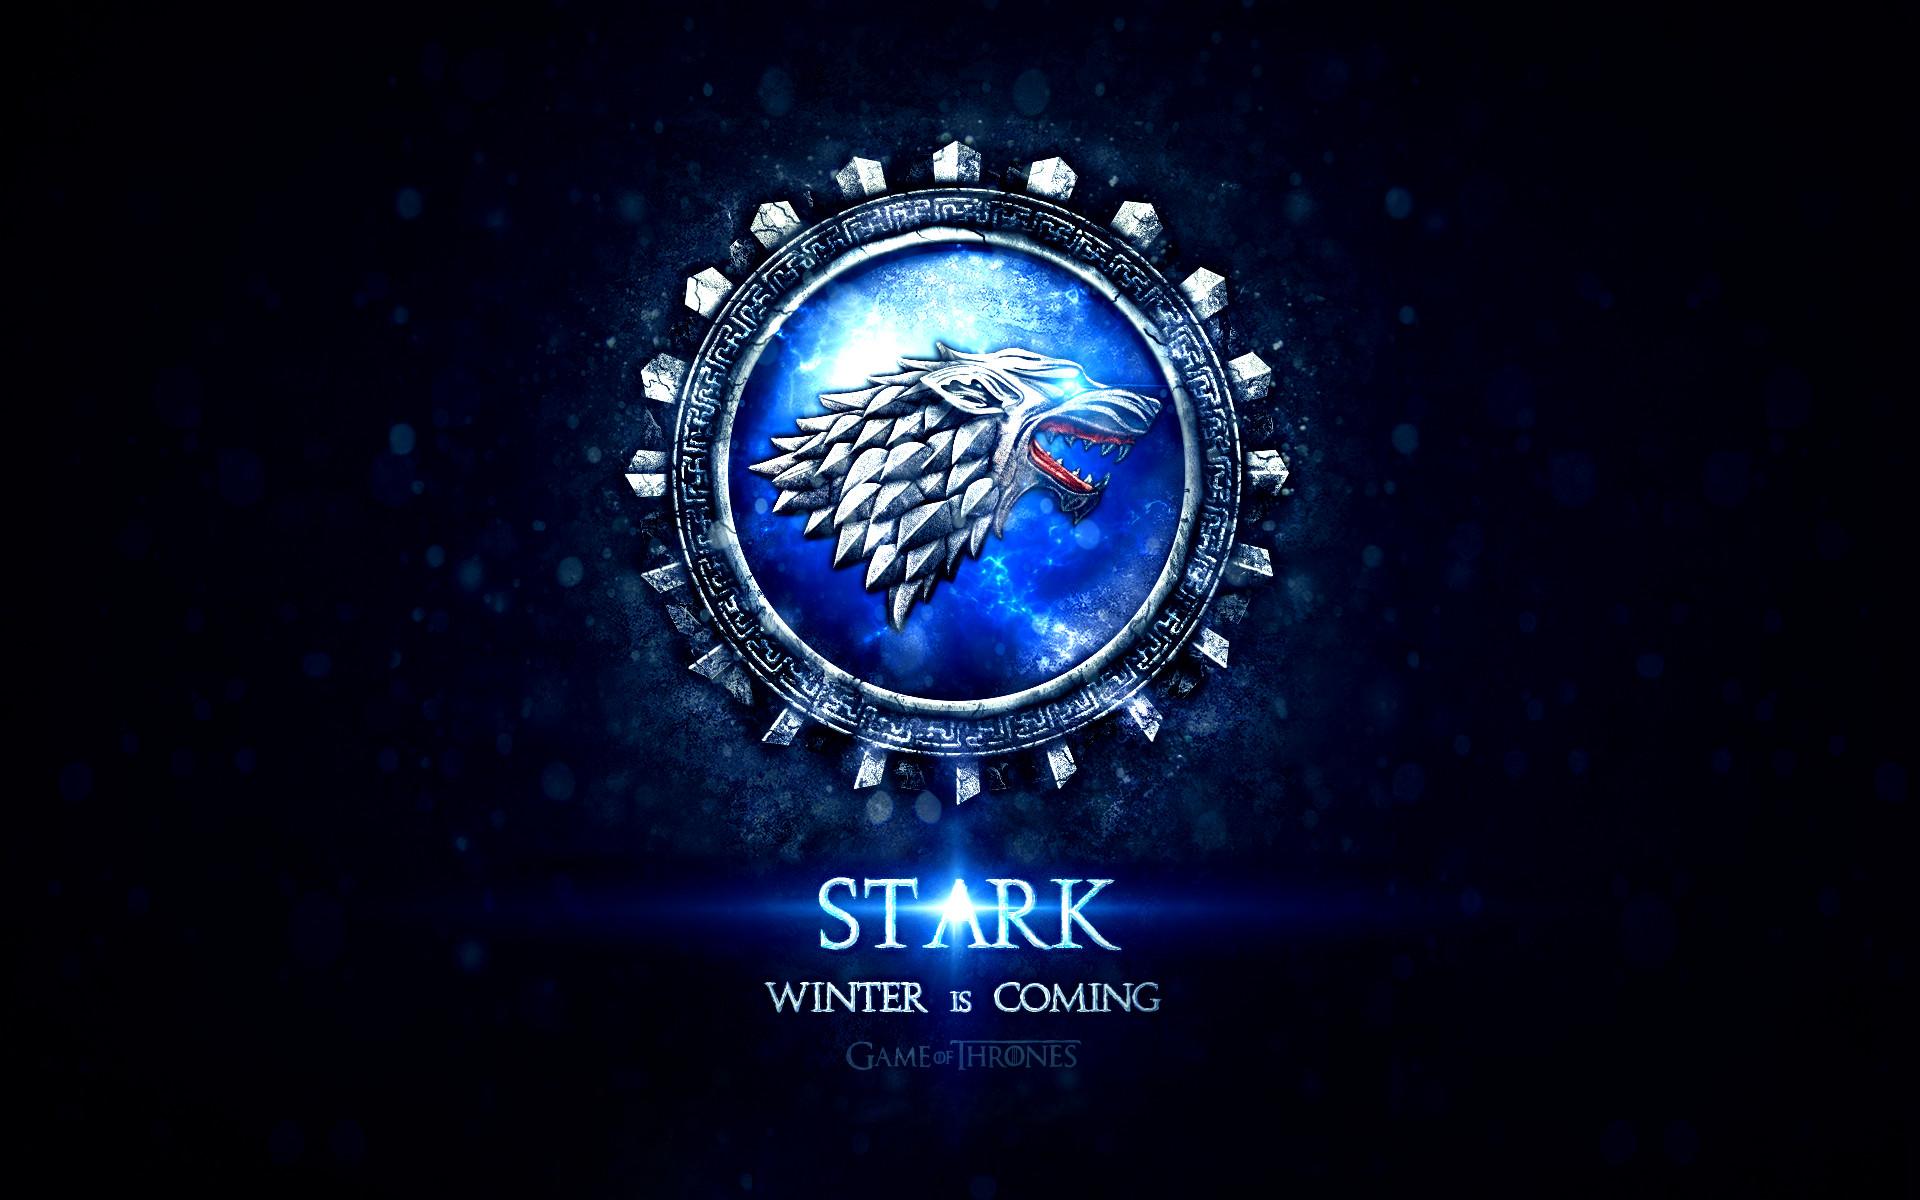 … Game of Thrones Stark wallpaper by jjfwh